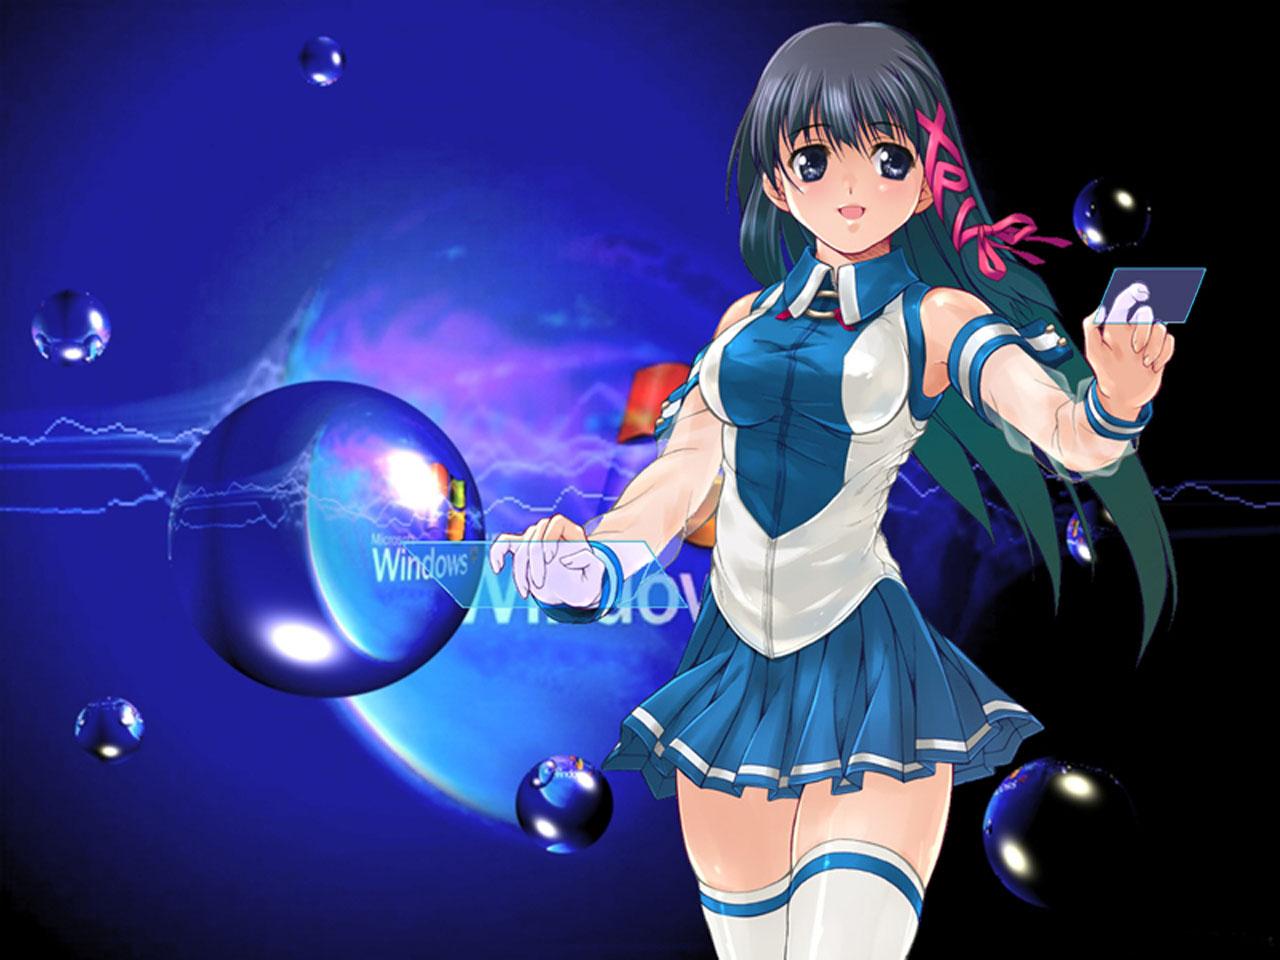 Anime Fille Gagner 7 Fond D Ecran Anime Windows 1280x960 Wallpapertip